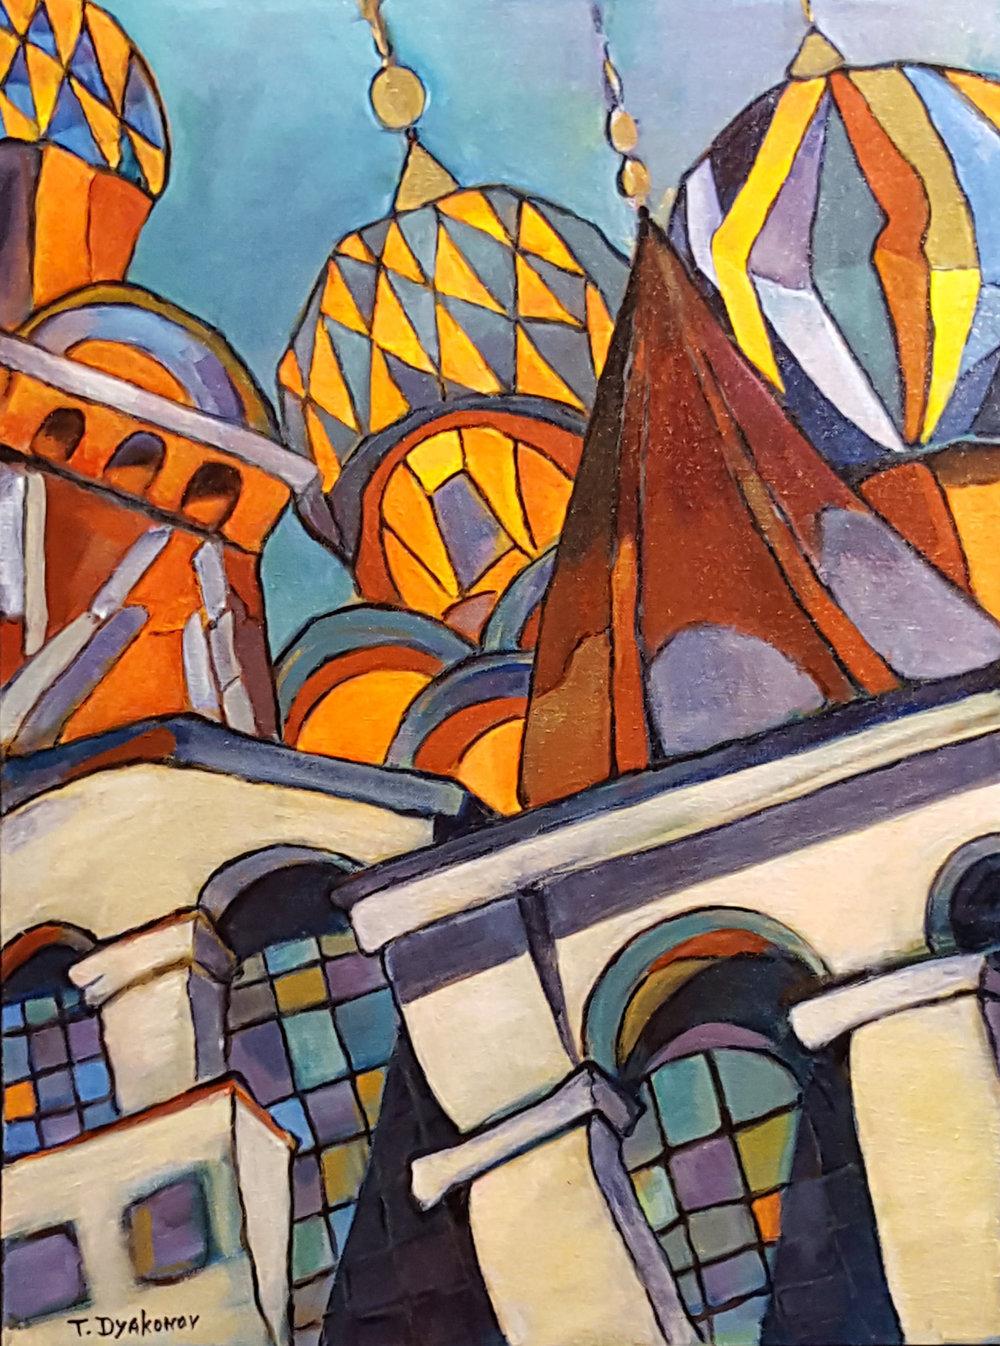 """St. Basil Cathedral"" by Tatyana Dyakonov"